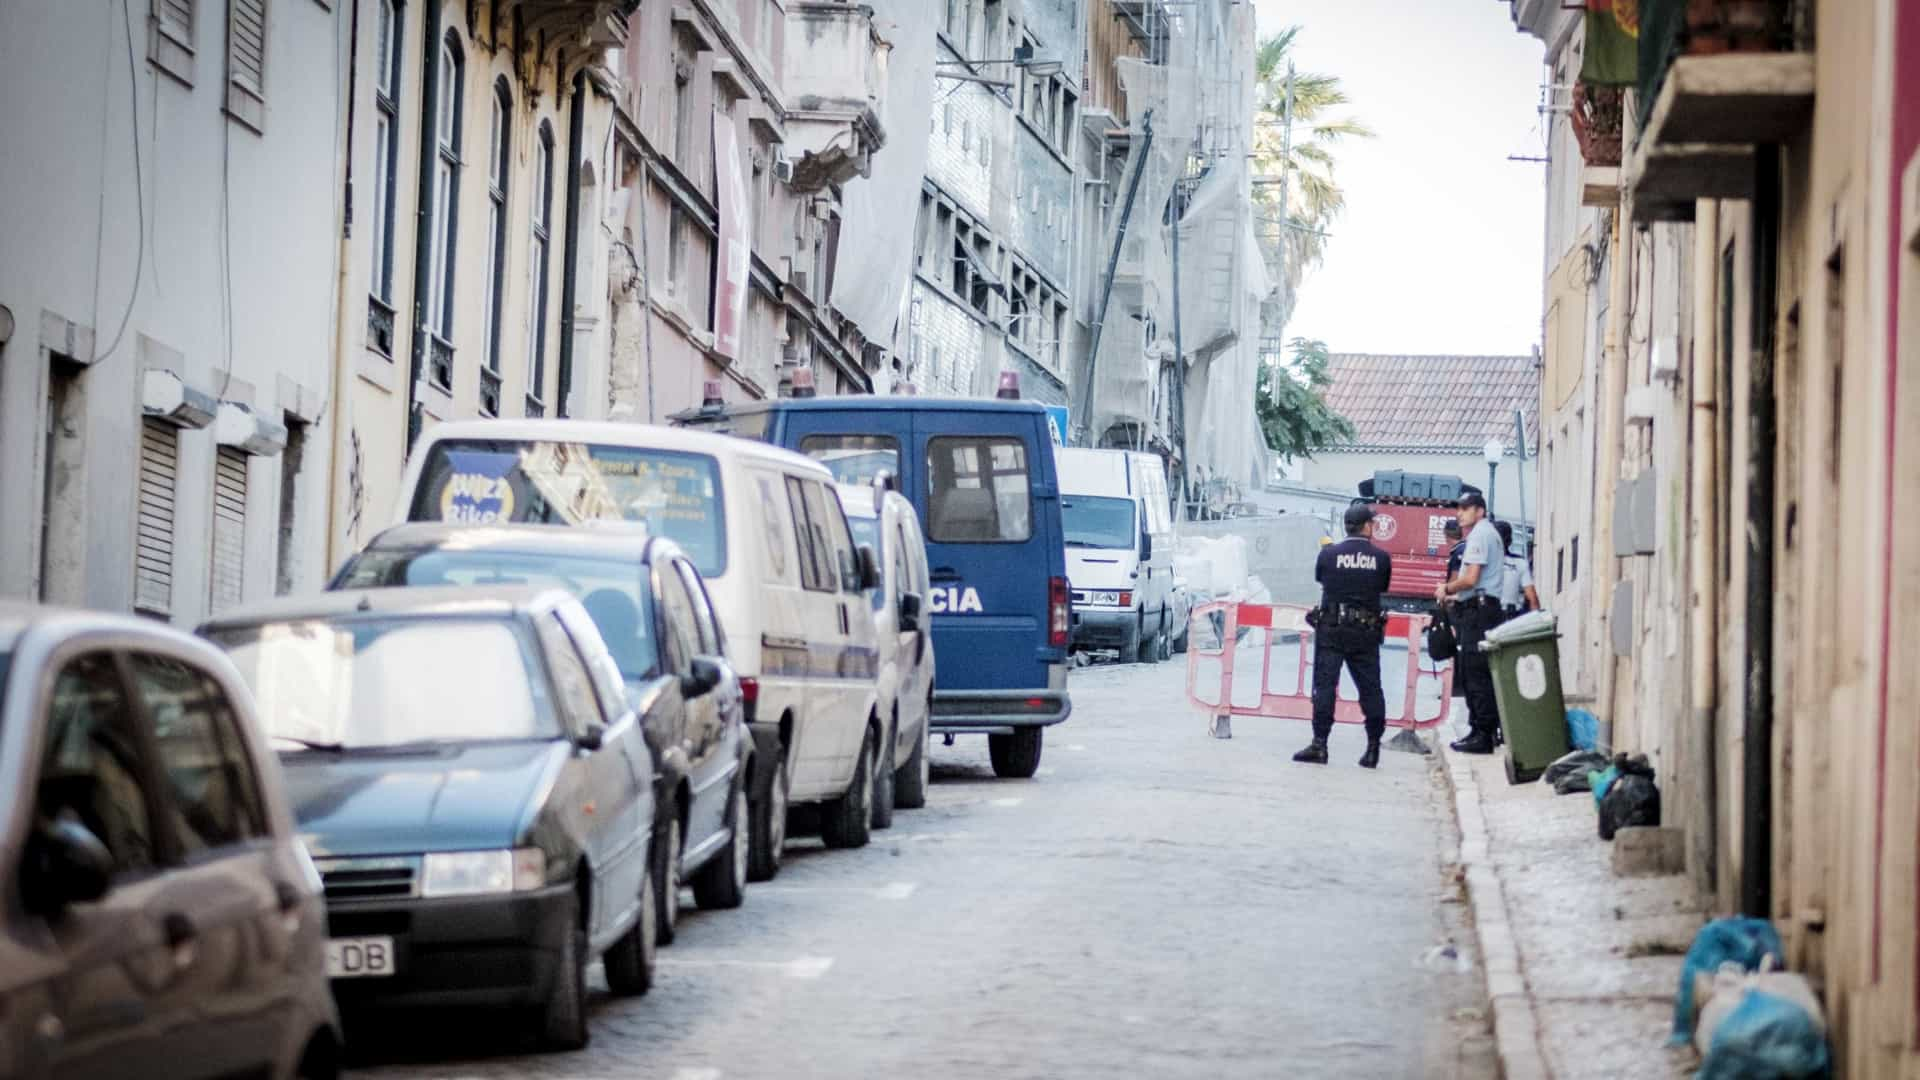 Zona onde ocorreu derrocada em Lisboa reaberta cerca das 20h